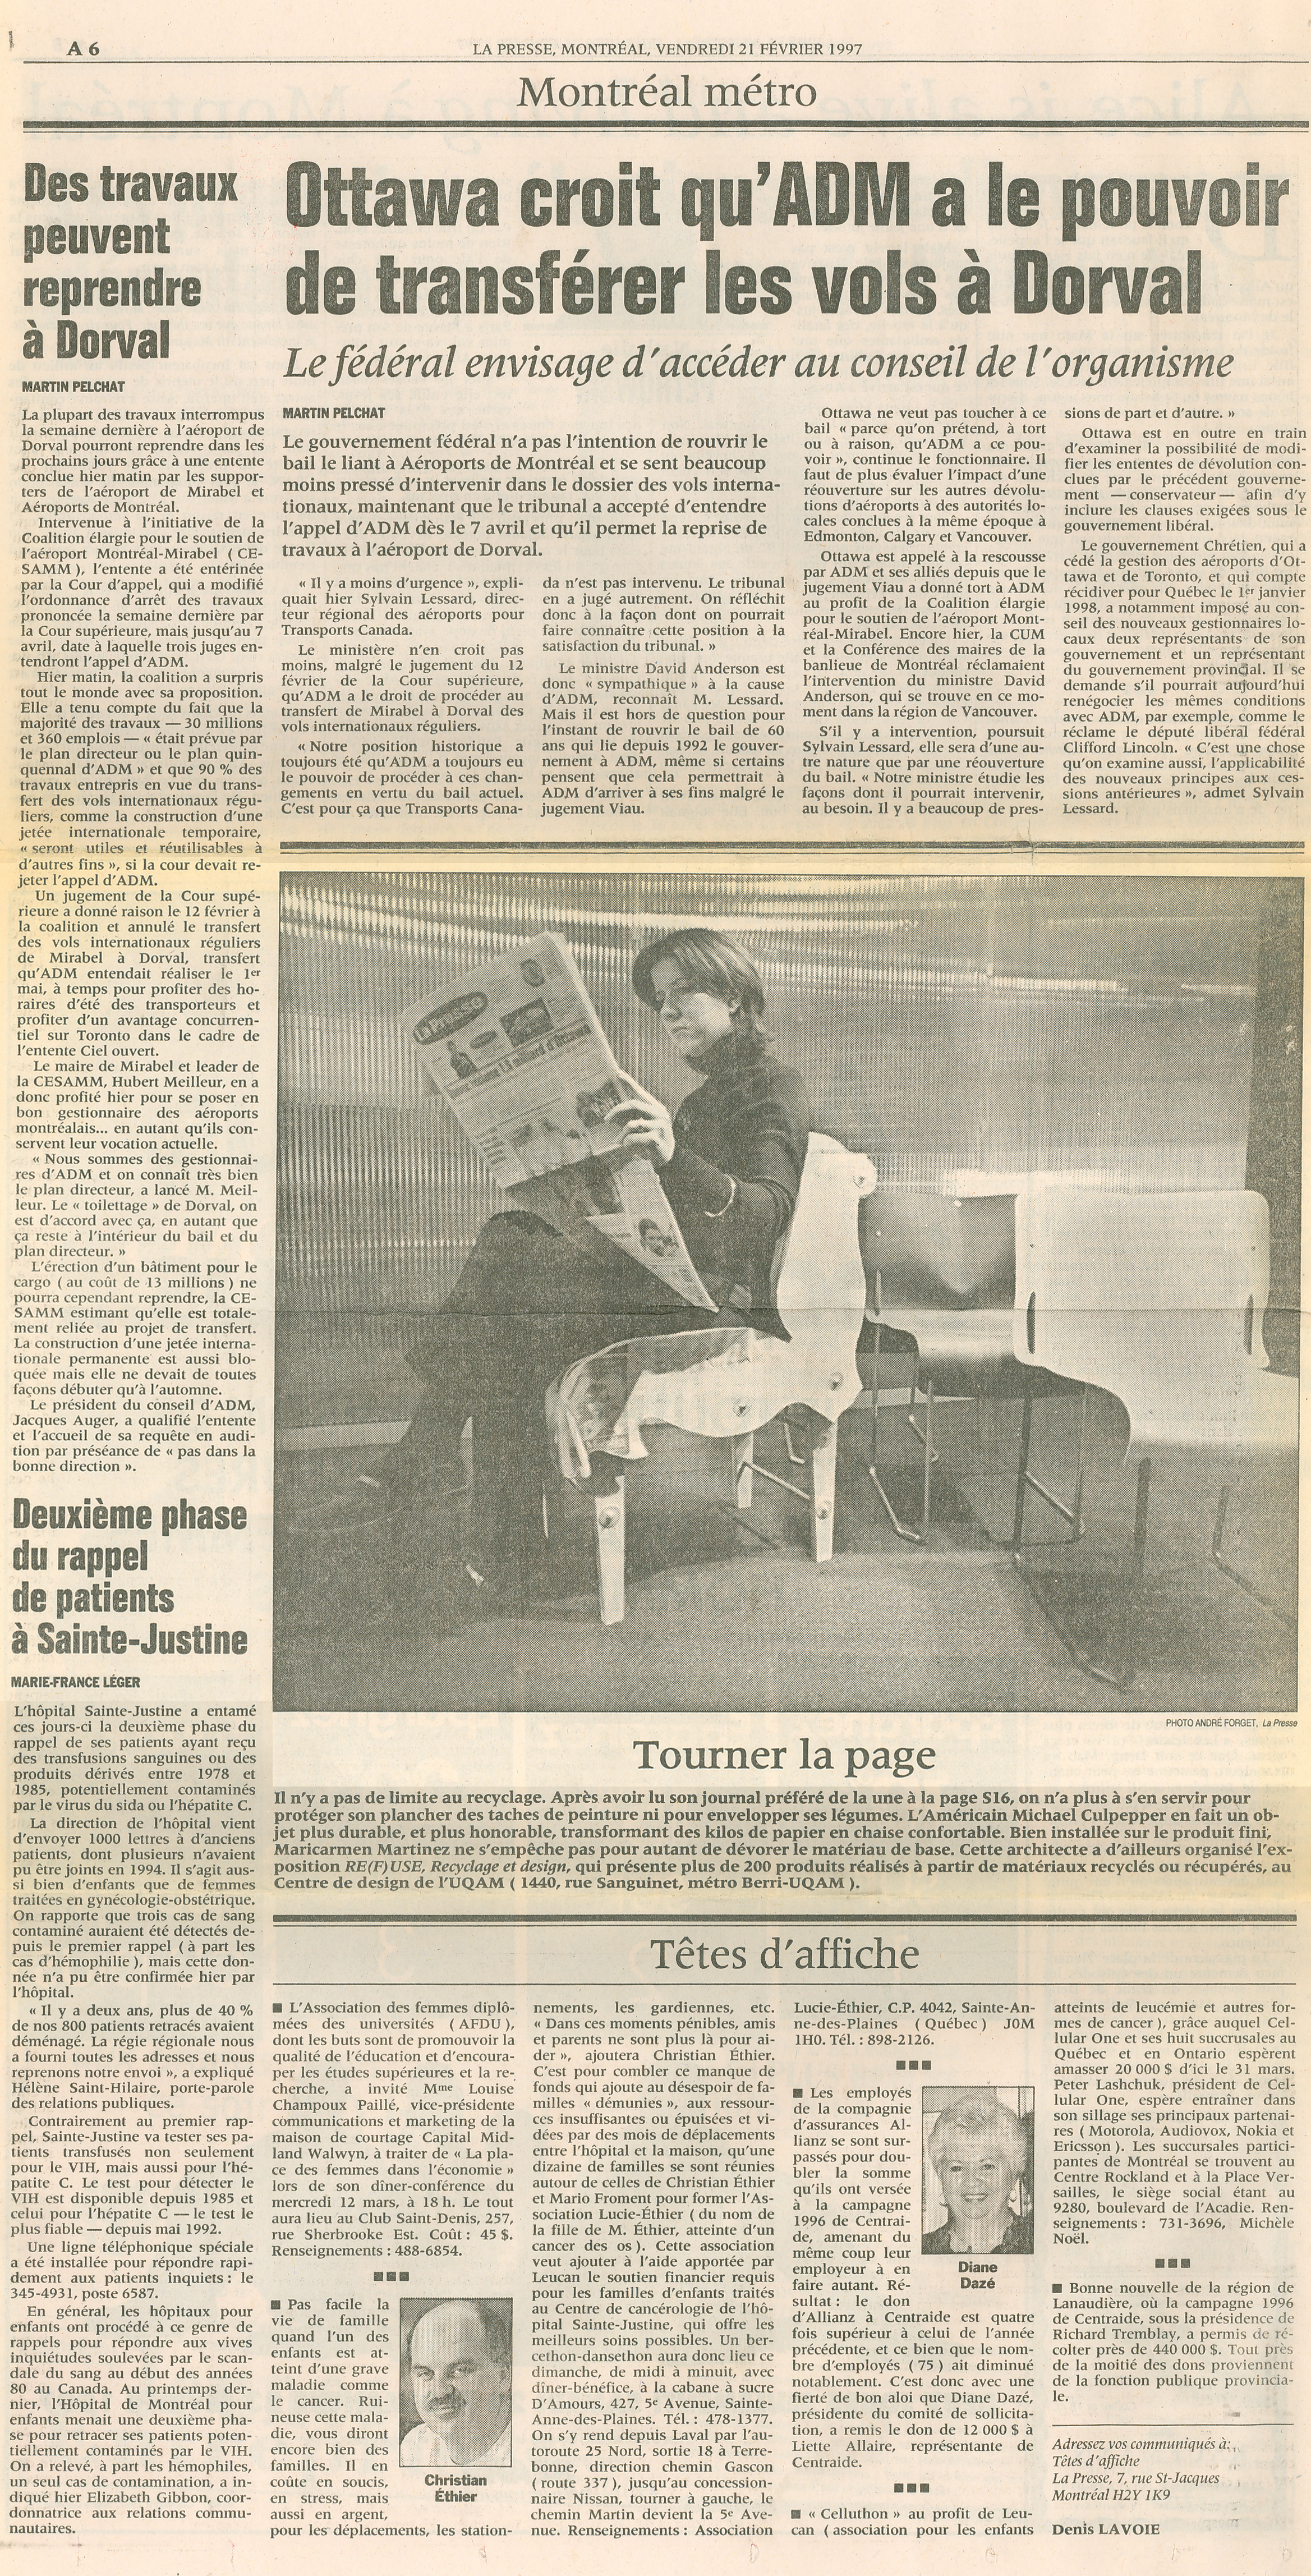 article Feb.21, 1997.jpg